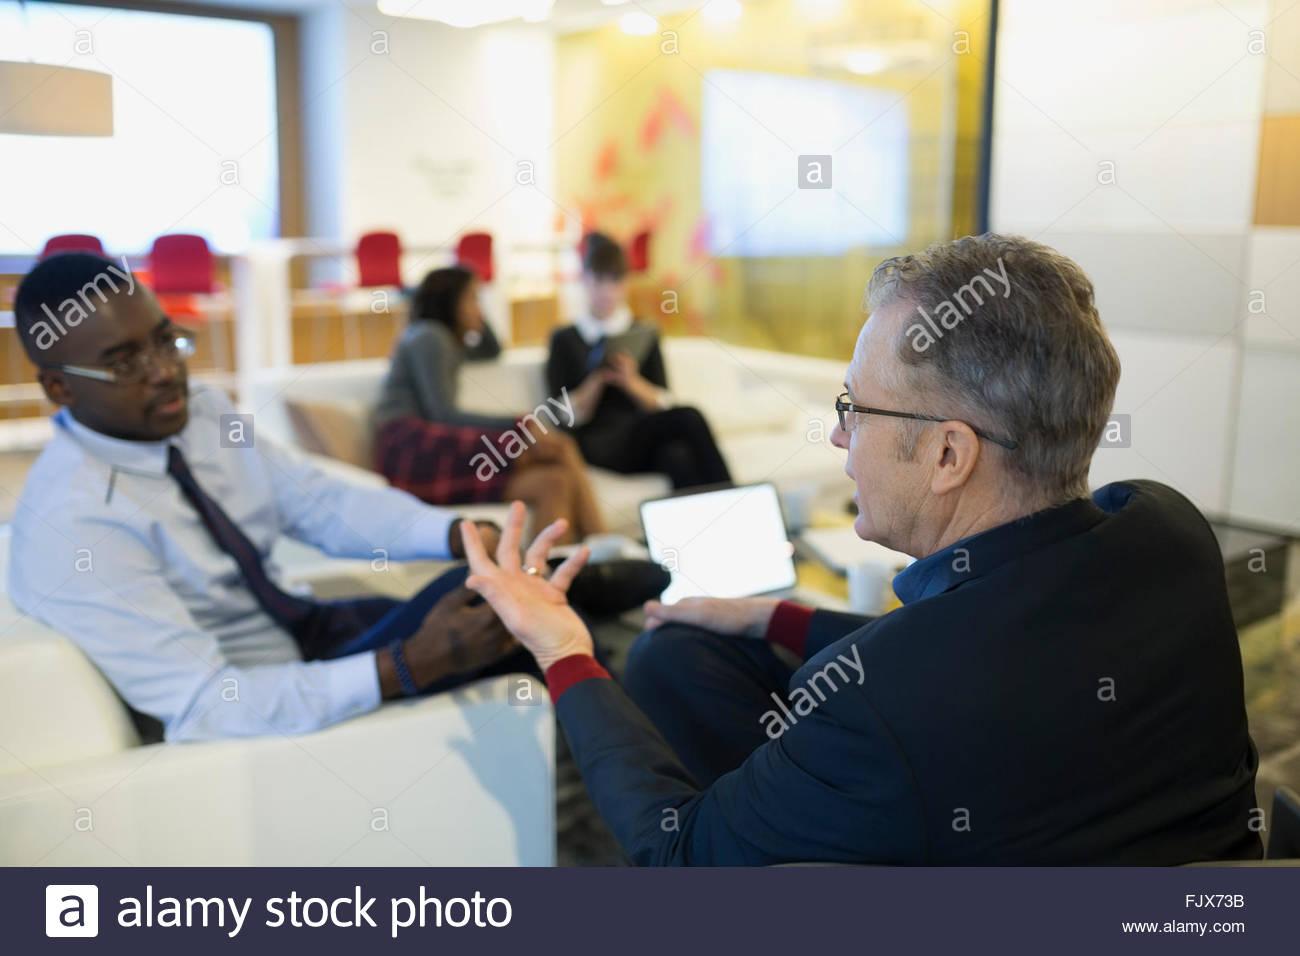 Businessmen talking in office lobby - Stock Image